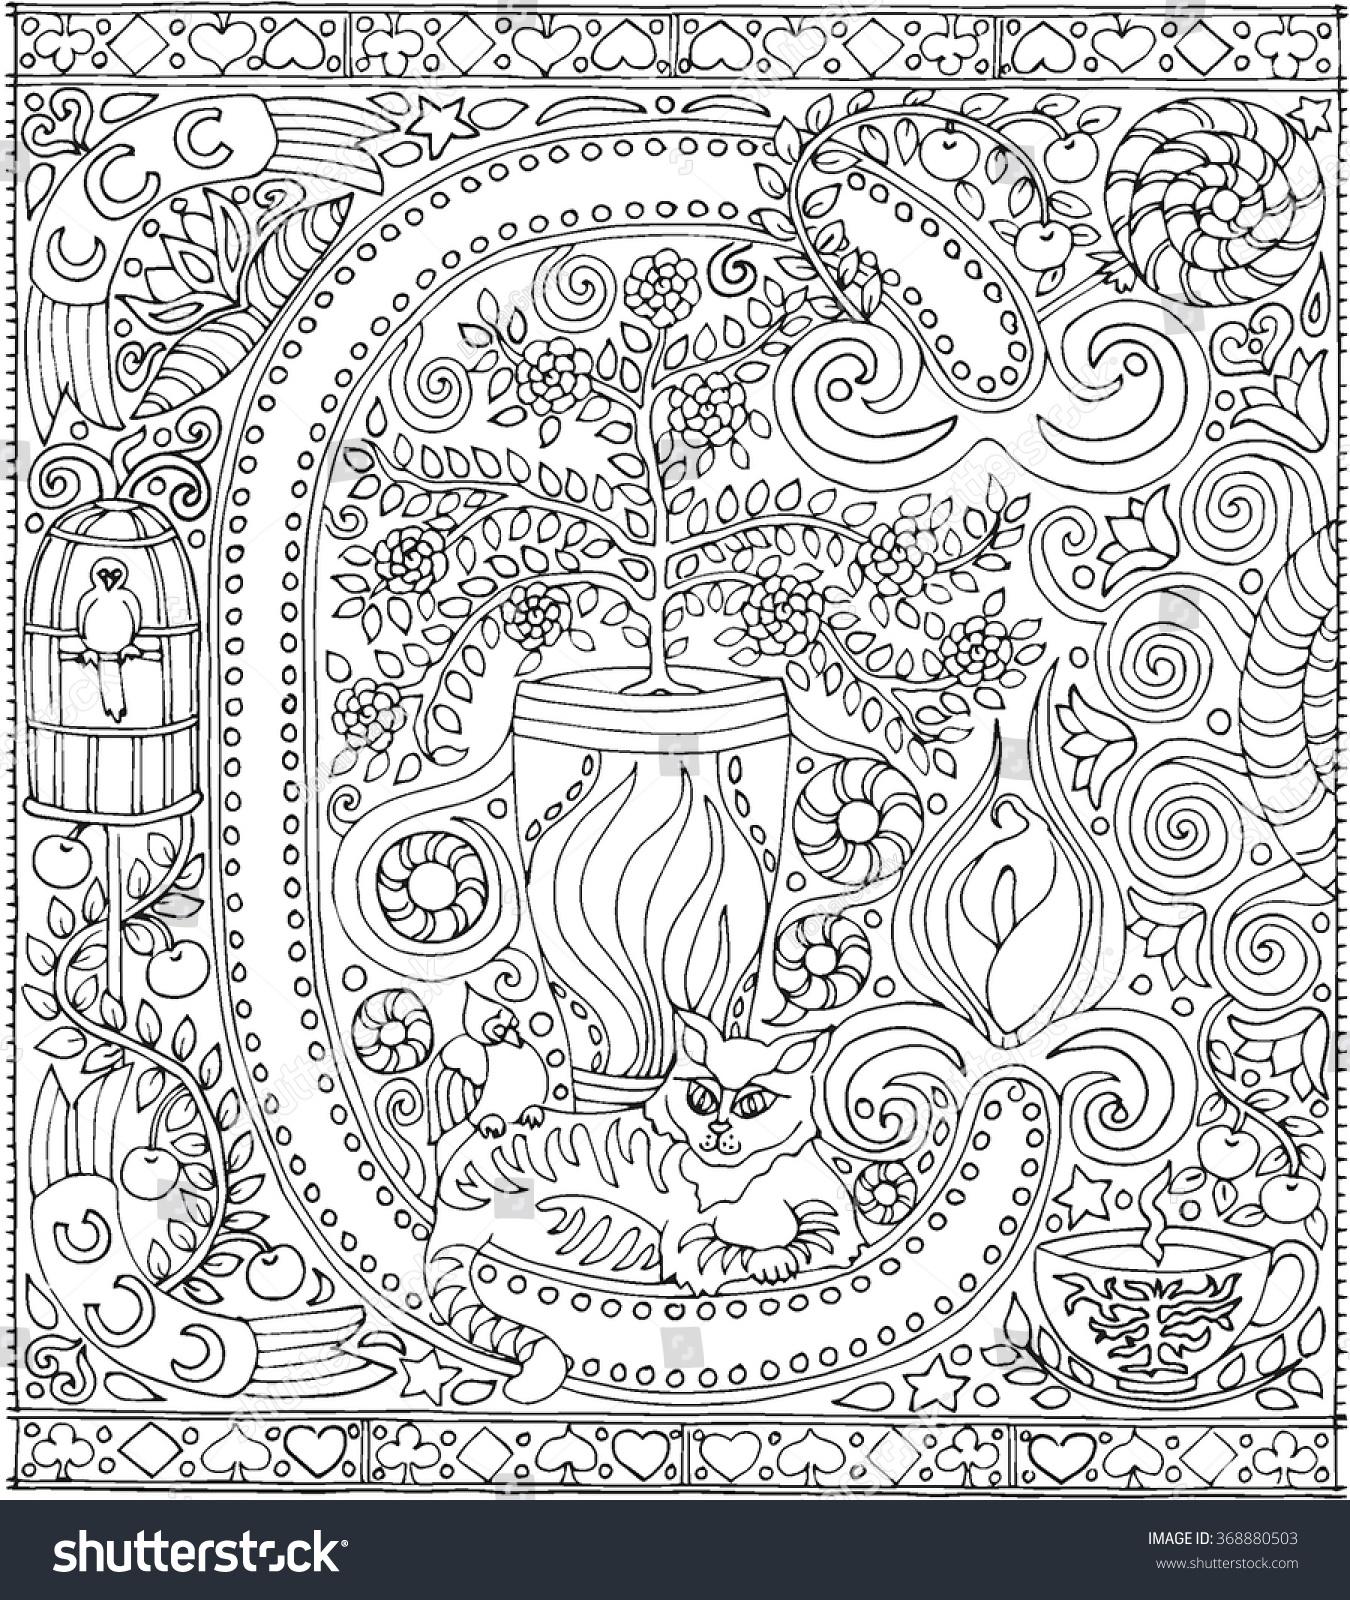 zen coloring nature pages - photo#25